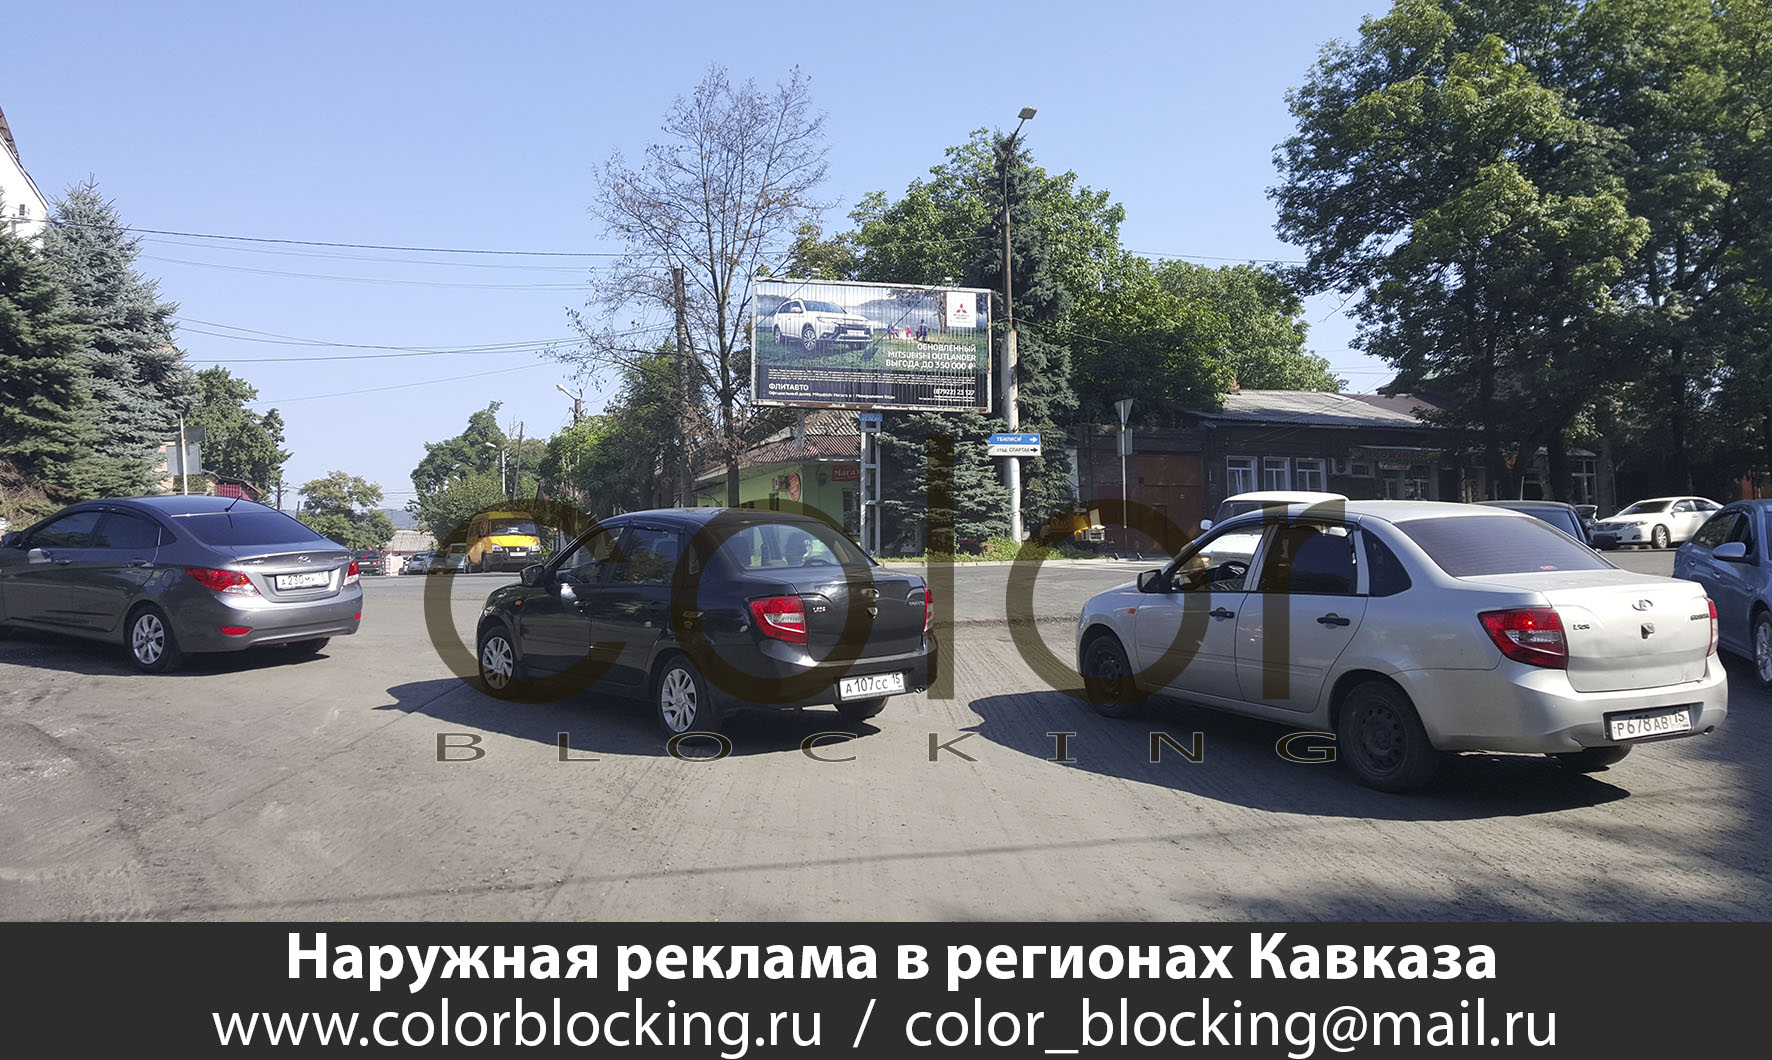 Реклама на билбордах в регионах Кавказа Осетия